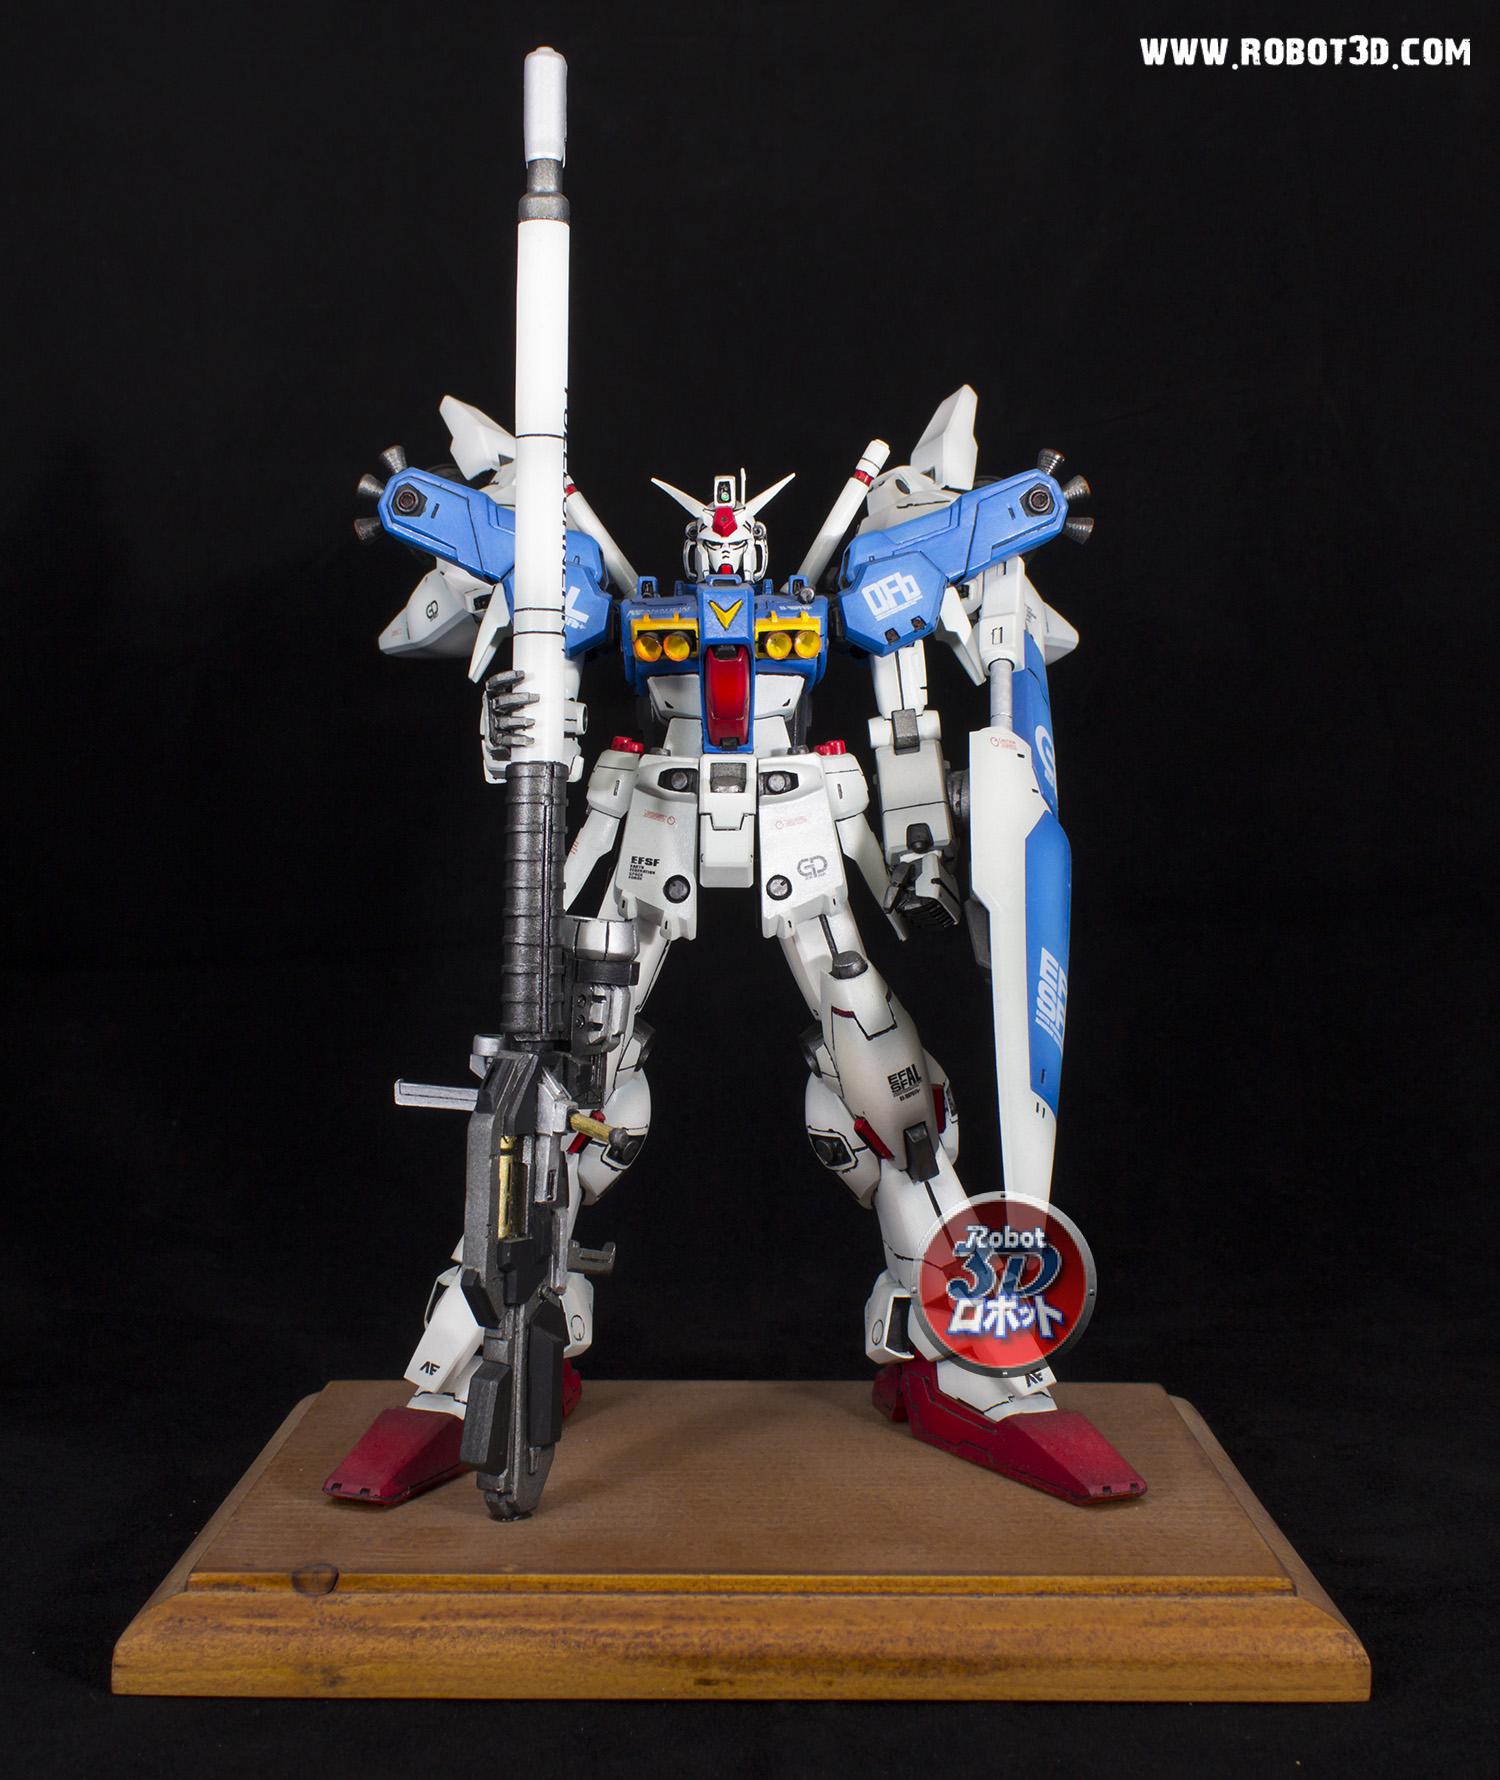 RX-78 Gundam GP01 Fb Zephyranthes